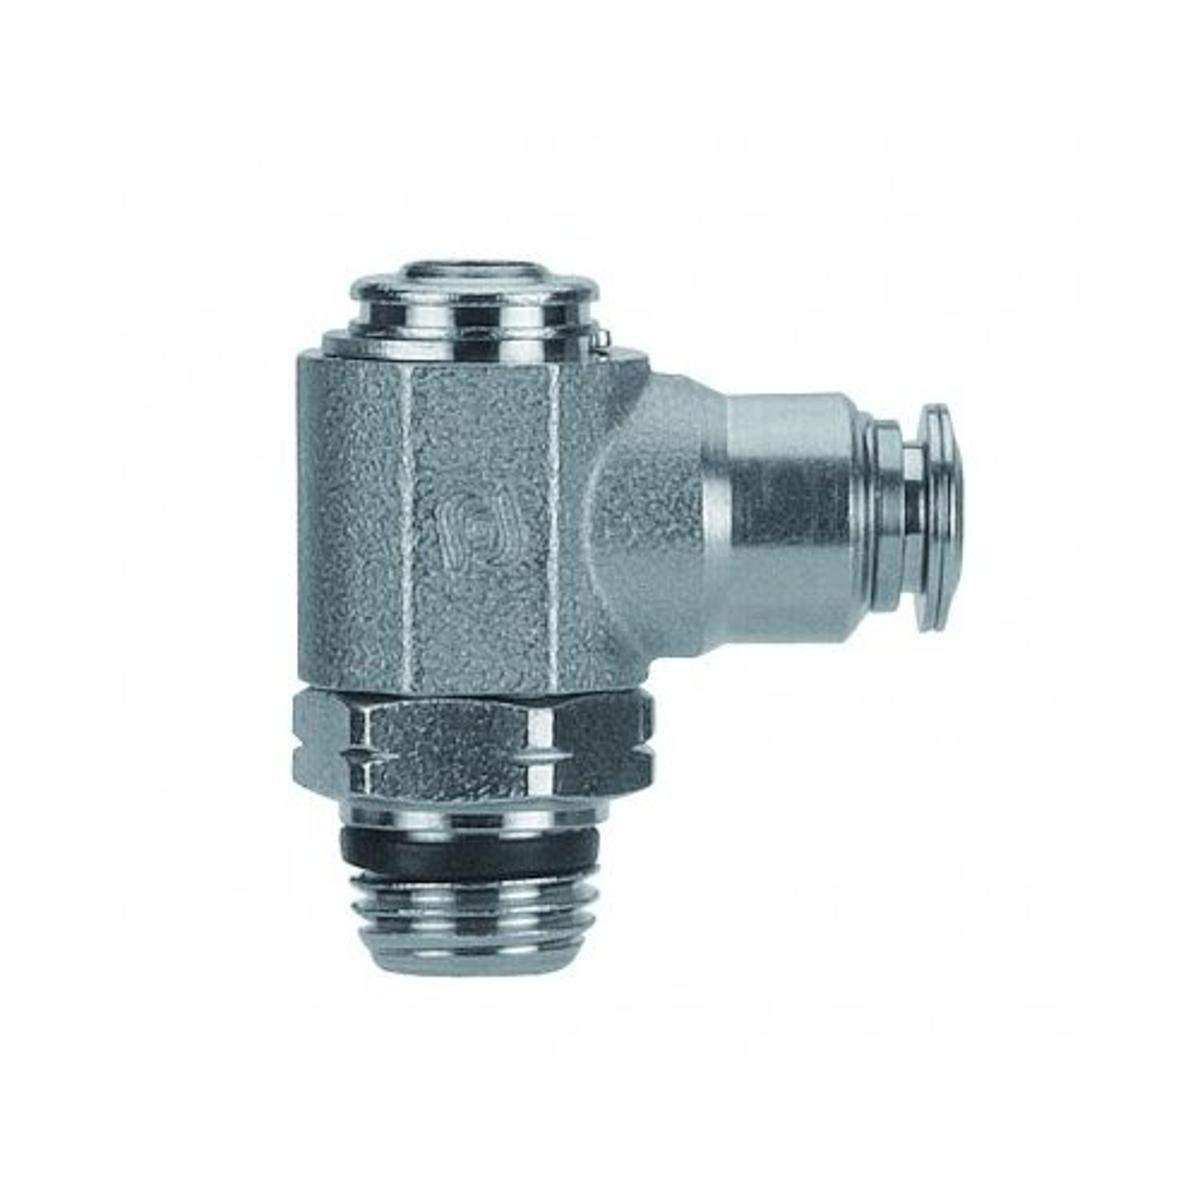 AIGNEP USA 89963-53-32 Flow Control, Screw Adjustment, Flow in, 5/32